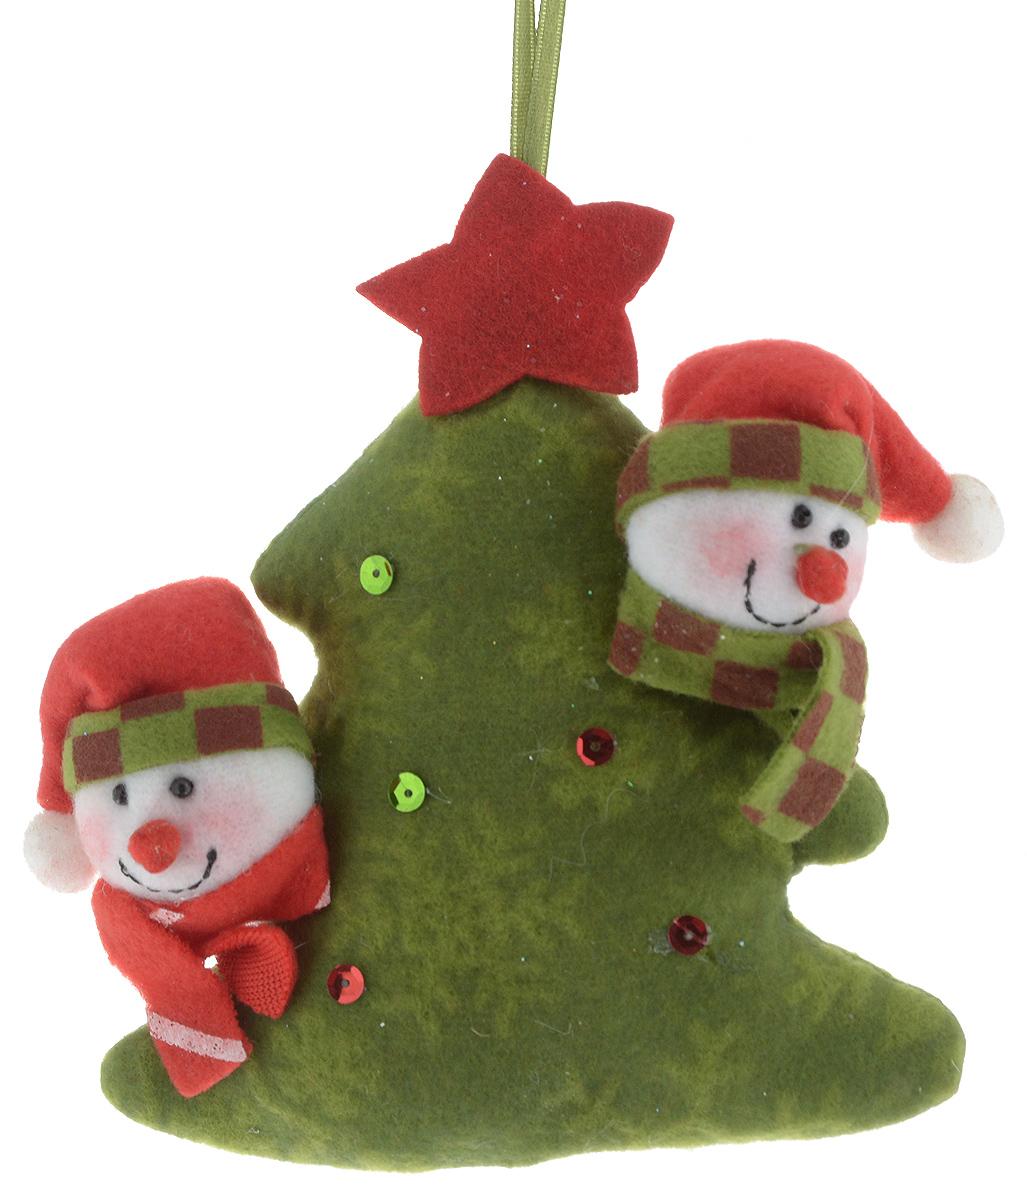 Украшение новогоднее подвесное Winter Wings Елка, 12,5 х 14,5 х 3,5 см украшение новогоднее настенное win max дед мороз 31 х 56 см